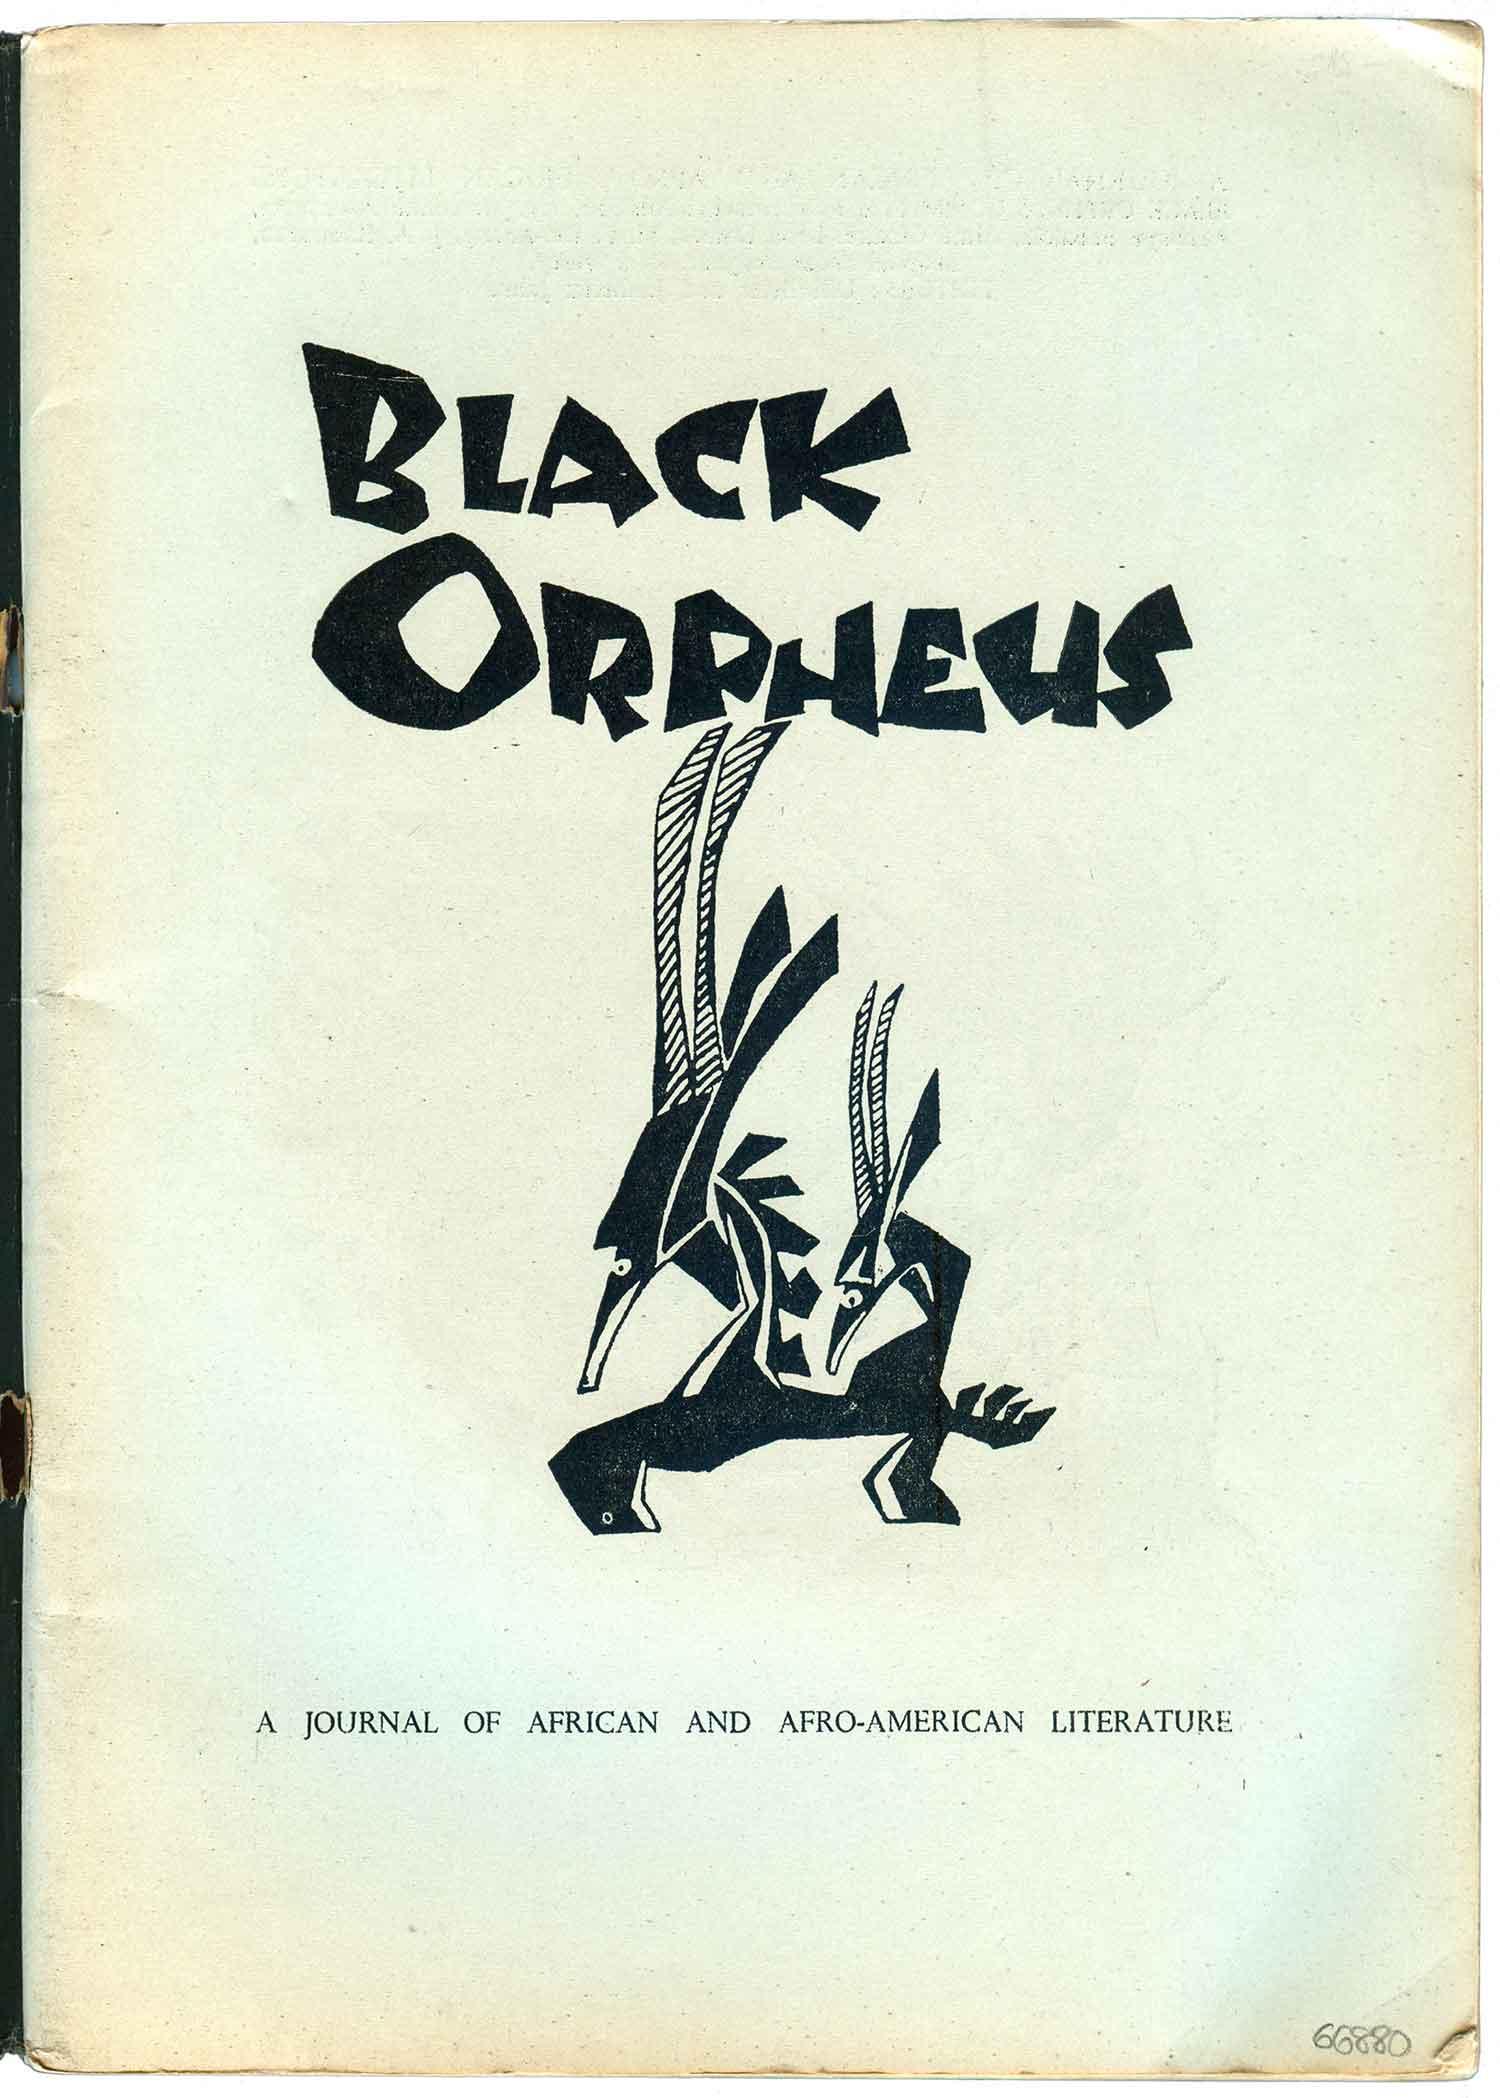 BlackOrpheus_n6_Mbari59_inside01